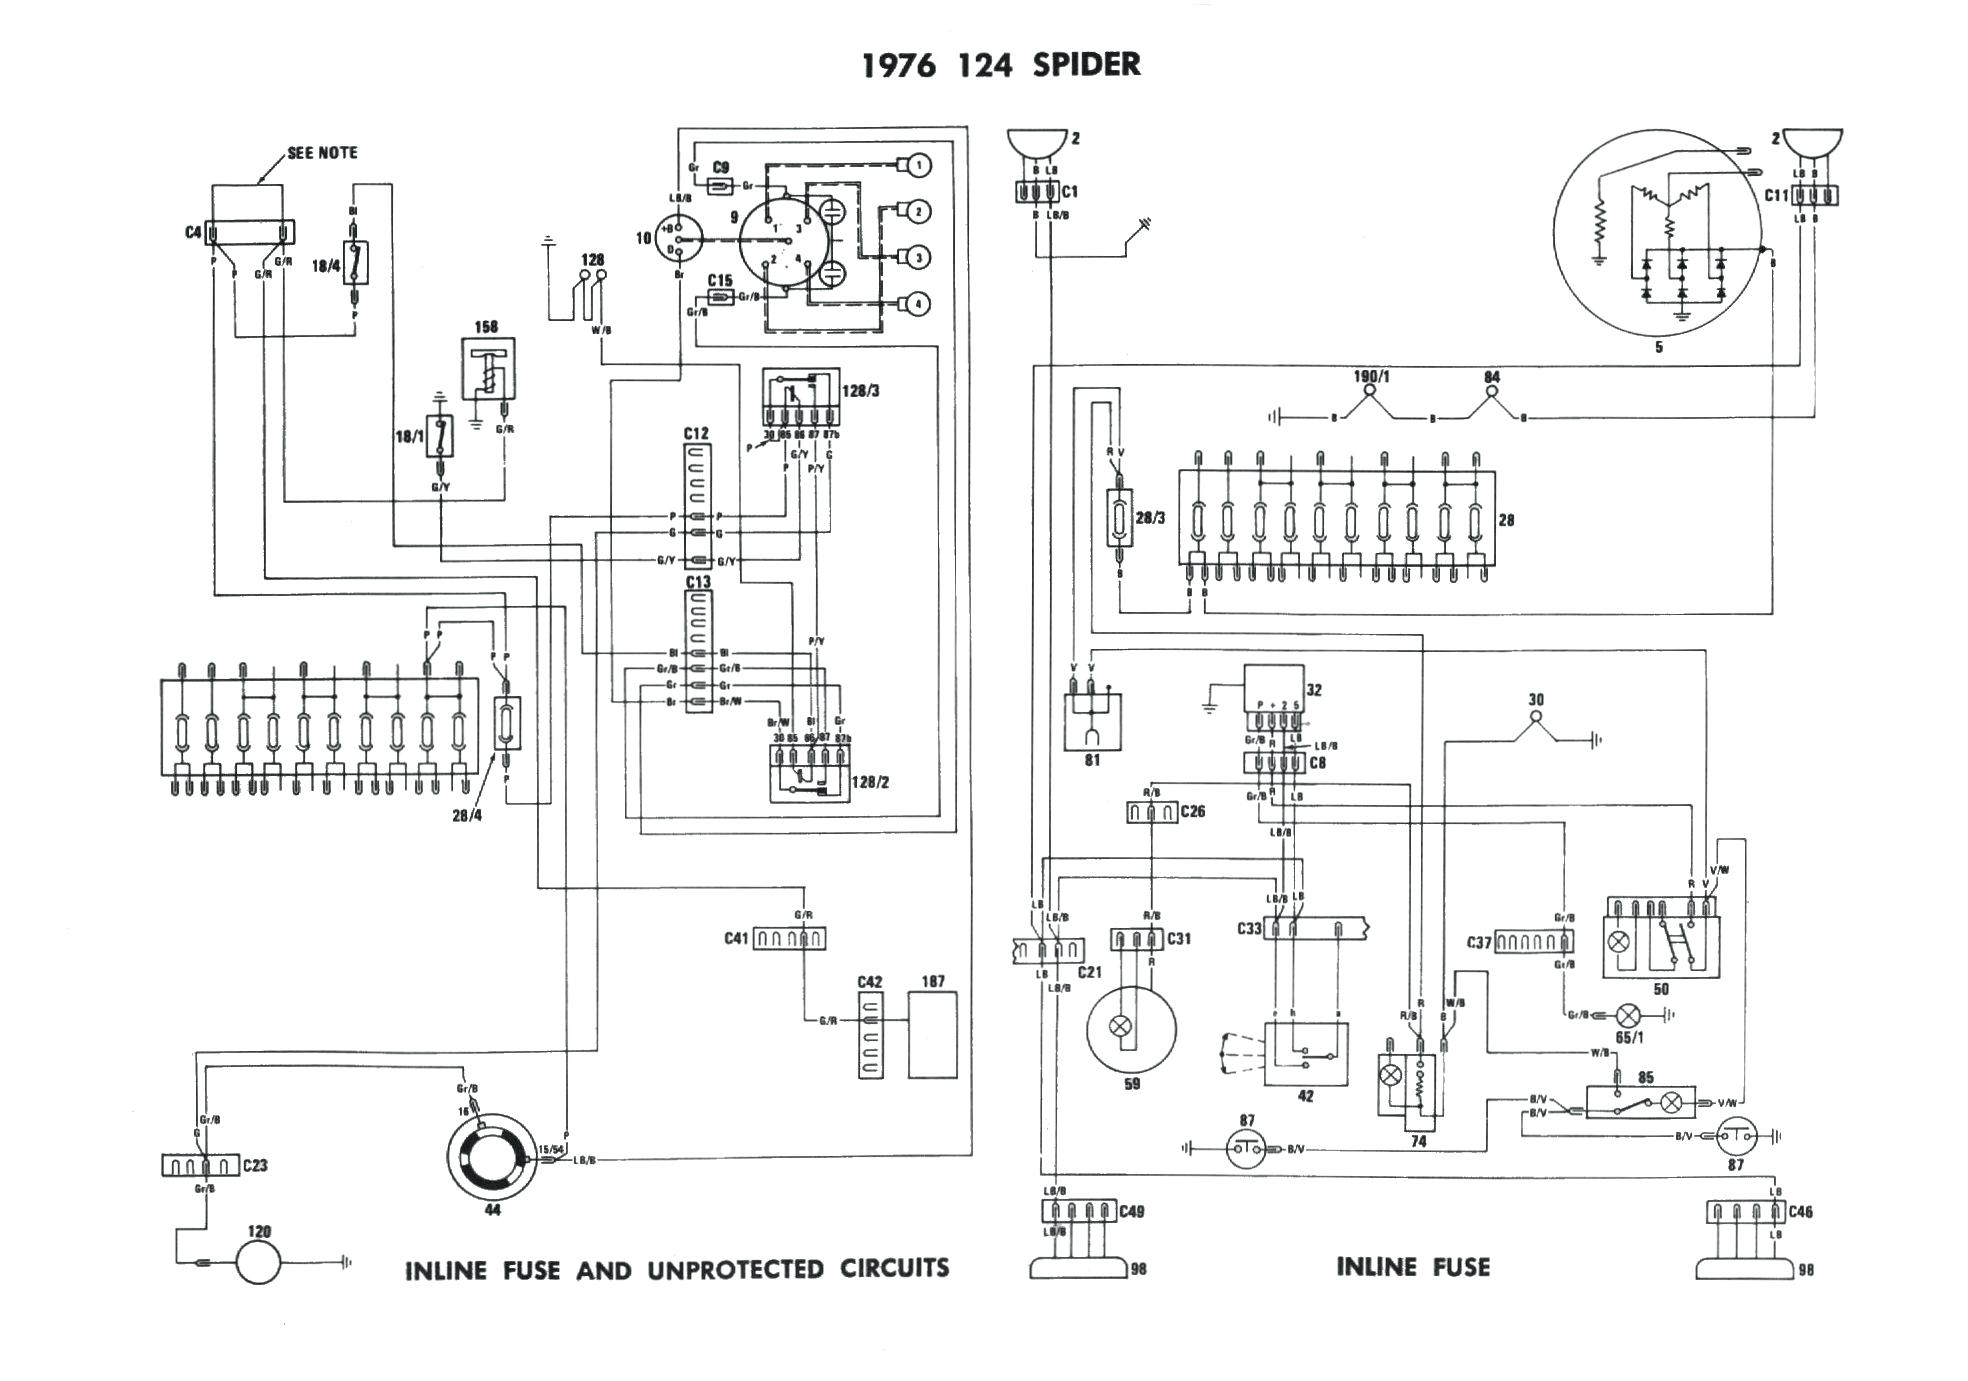 4EO_172] 1973 Fiat 128 Sedan Wiring | power-advantage wiring diagram option  | power-advantage.confort-satisfaction.fr